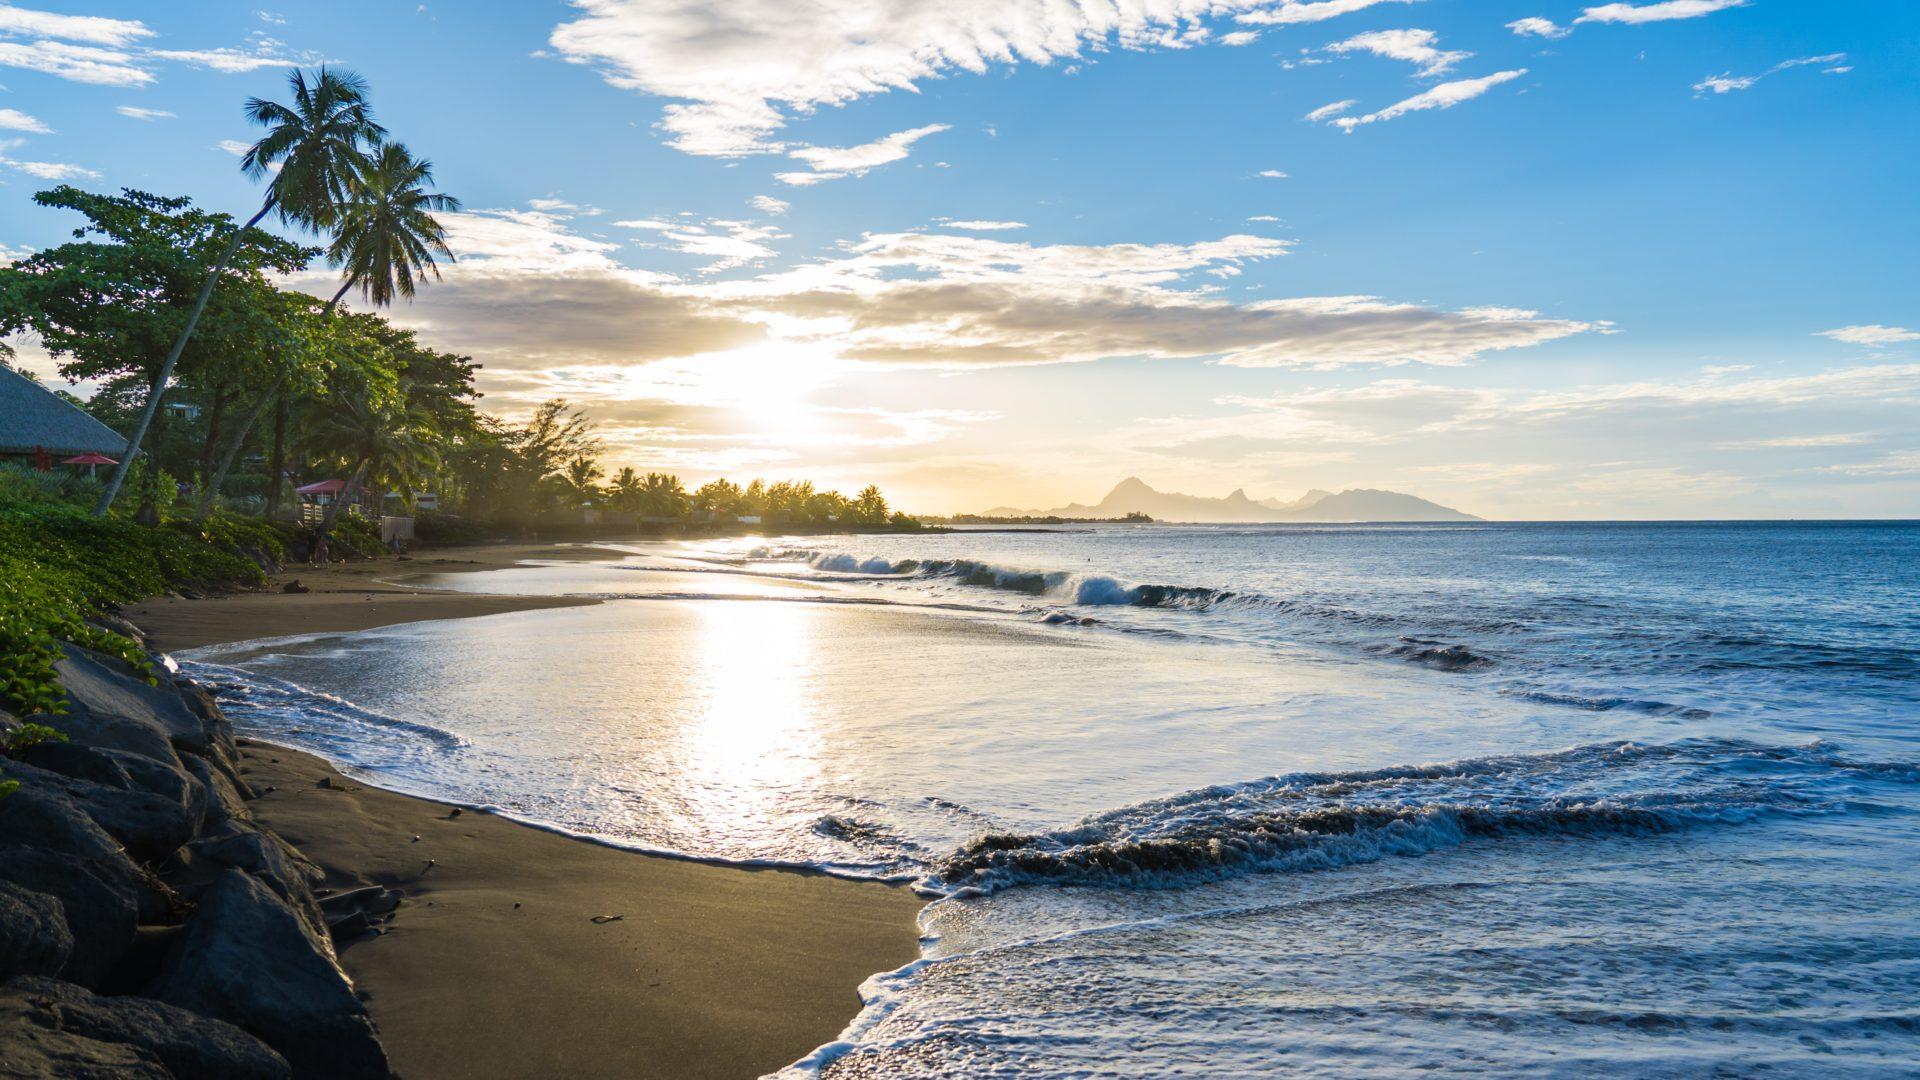 French Polynesia Ra'iatea Ocean Beach Shoreline Palm Tree TJB Superyachts